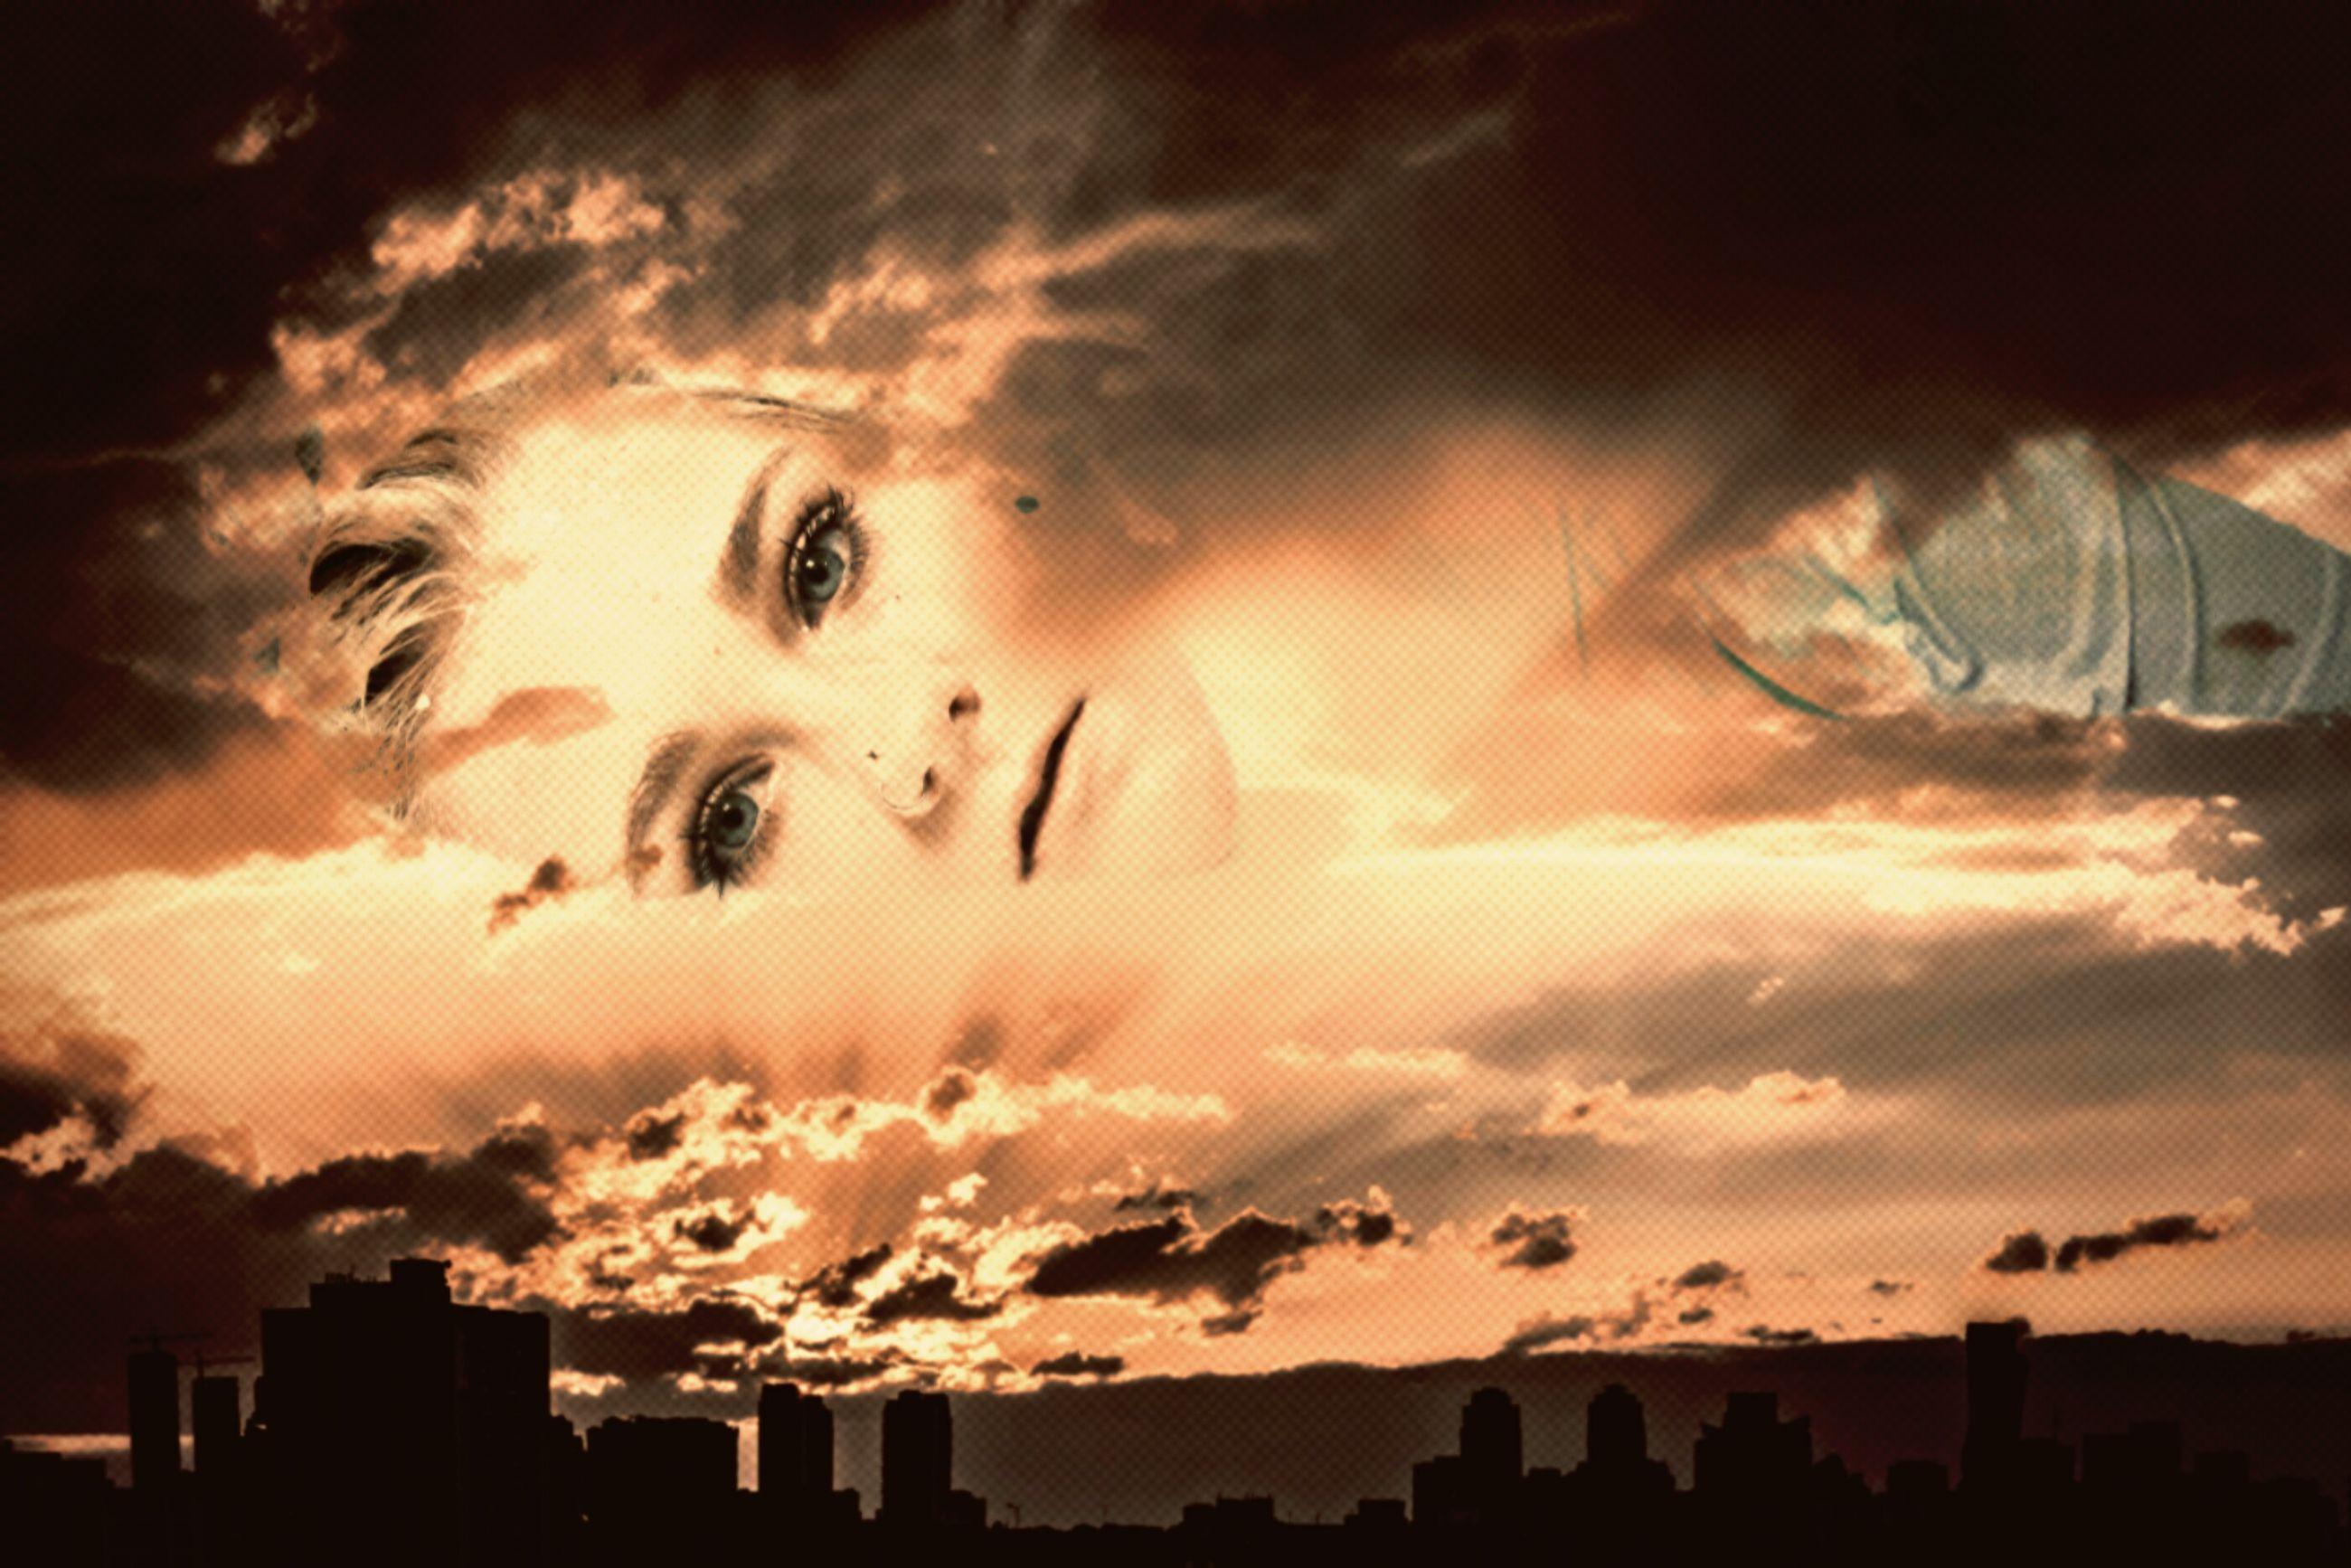 sunset, sky, cloud - sky, cloudy, city, orange color, weather, cloud, dramatic sky, outdoors, cityscape, nature, scenics, beauty in nature, overcast, sun, no people, city life, cloudscape, illuminated, tranquility, multi colored, idyllic